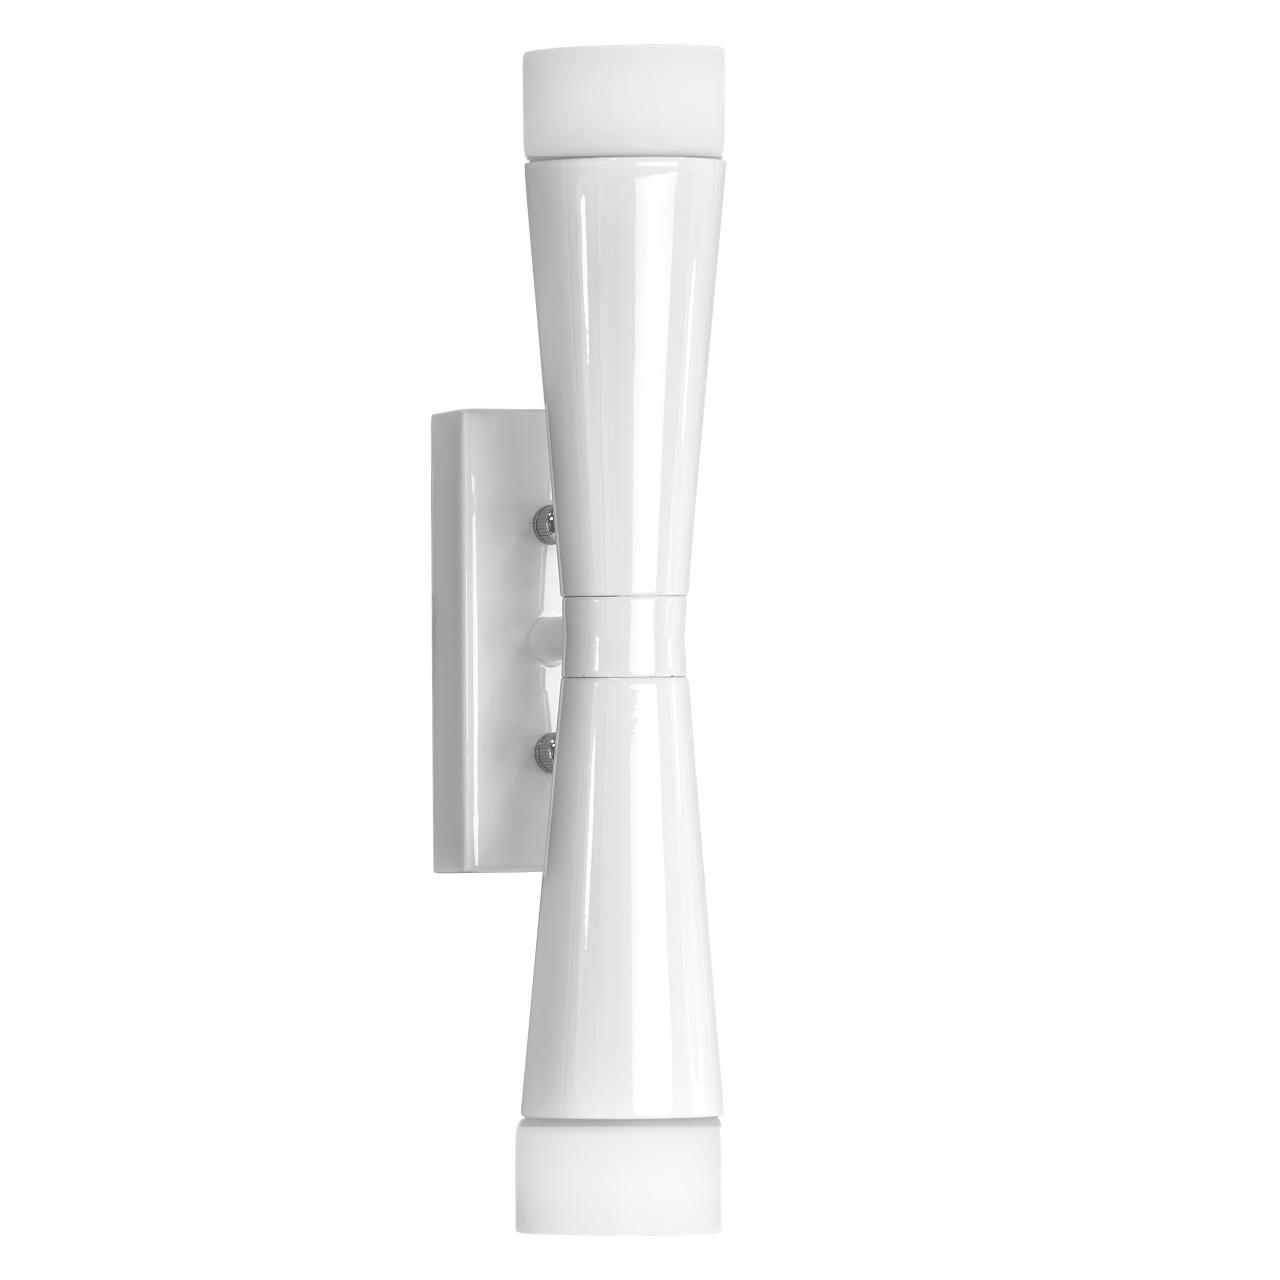 Бра Punto 2х7W G9 (Led) белый Lightstar 807626